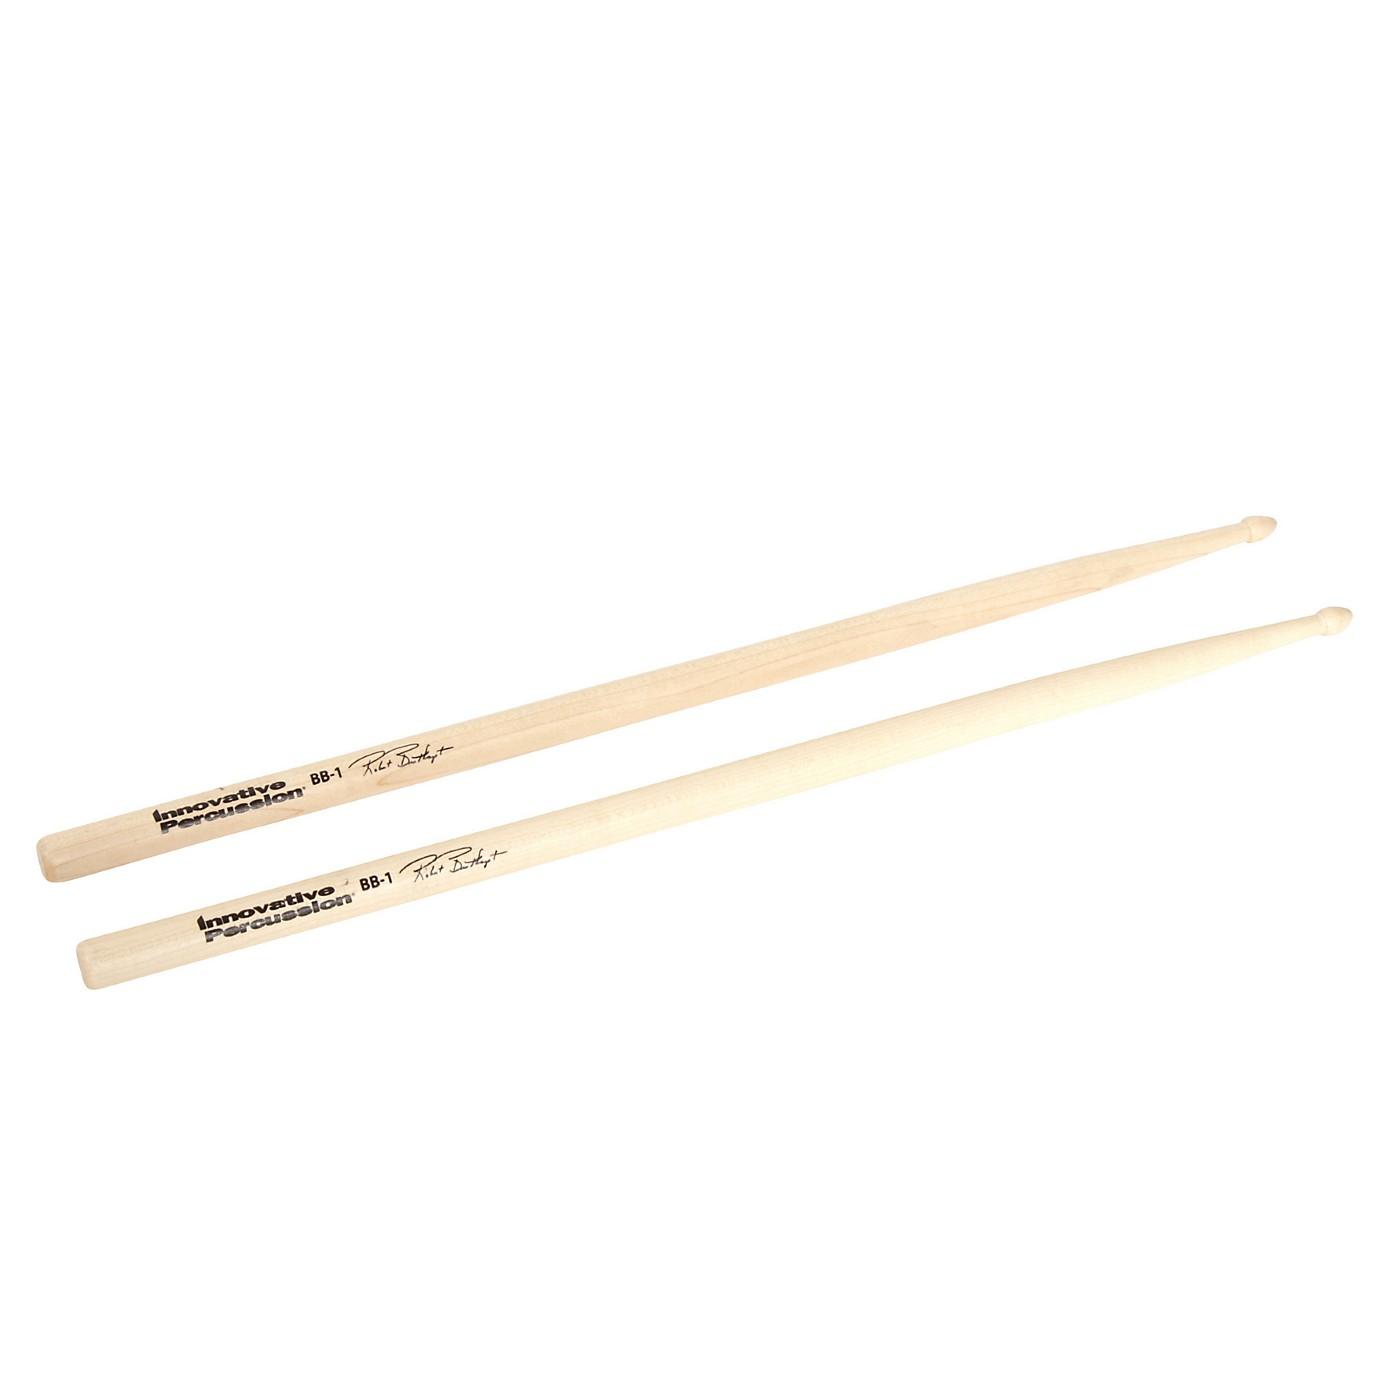 Innovative Percussion Bob Breithaupt Model Drumstick thumbnail